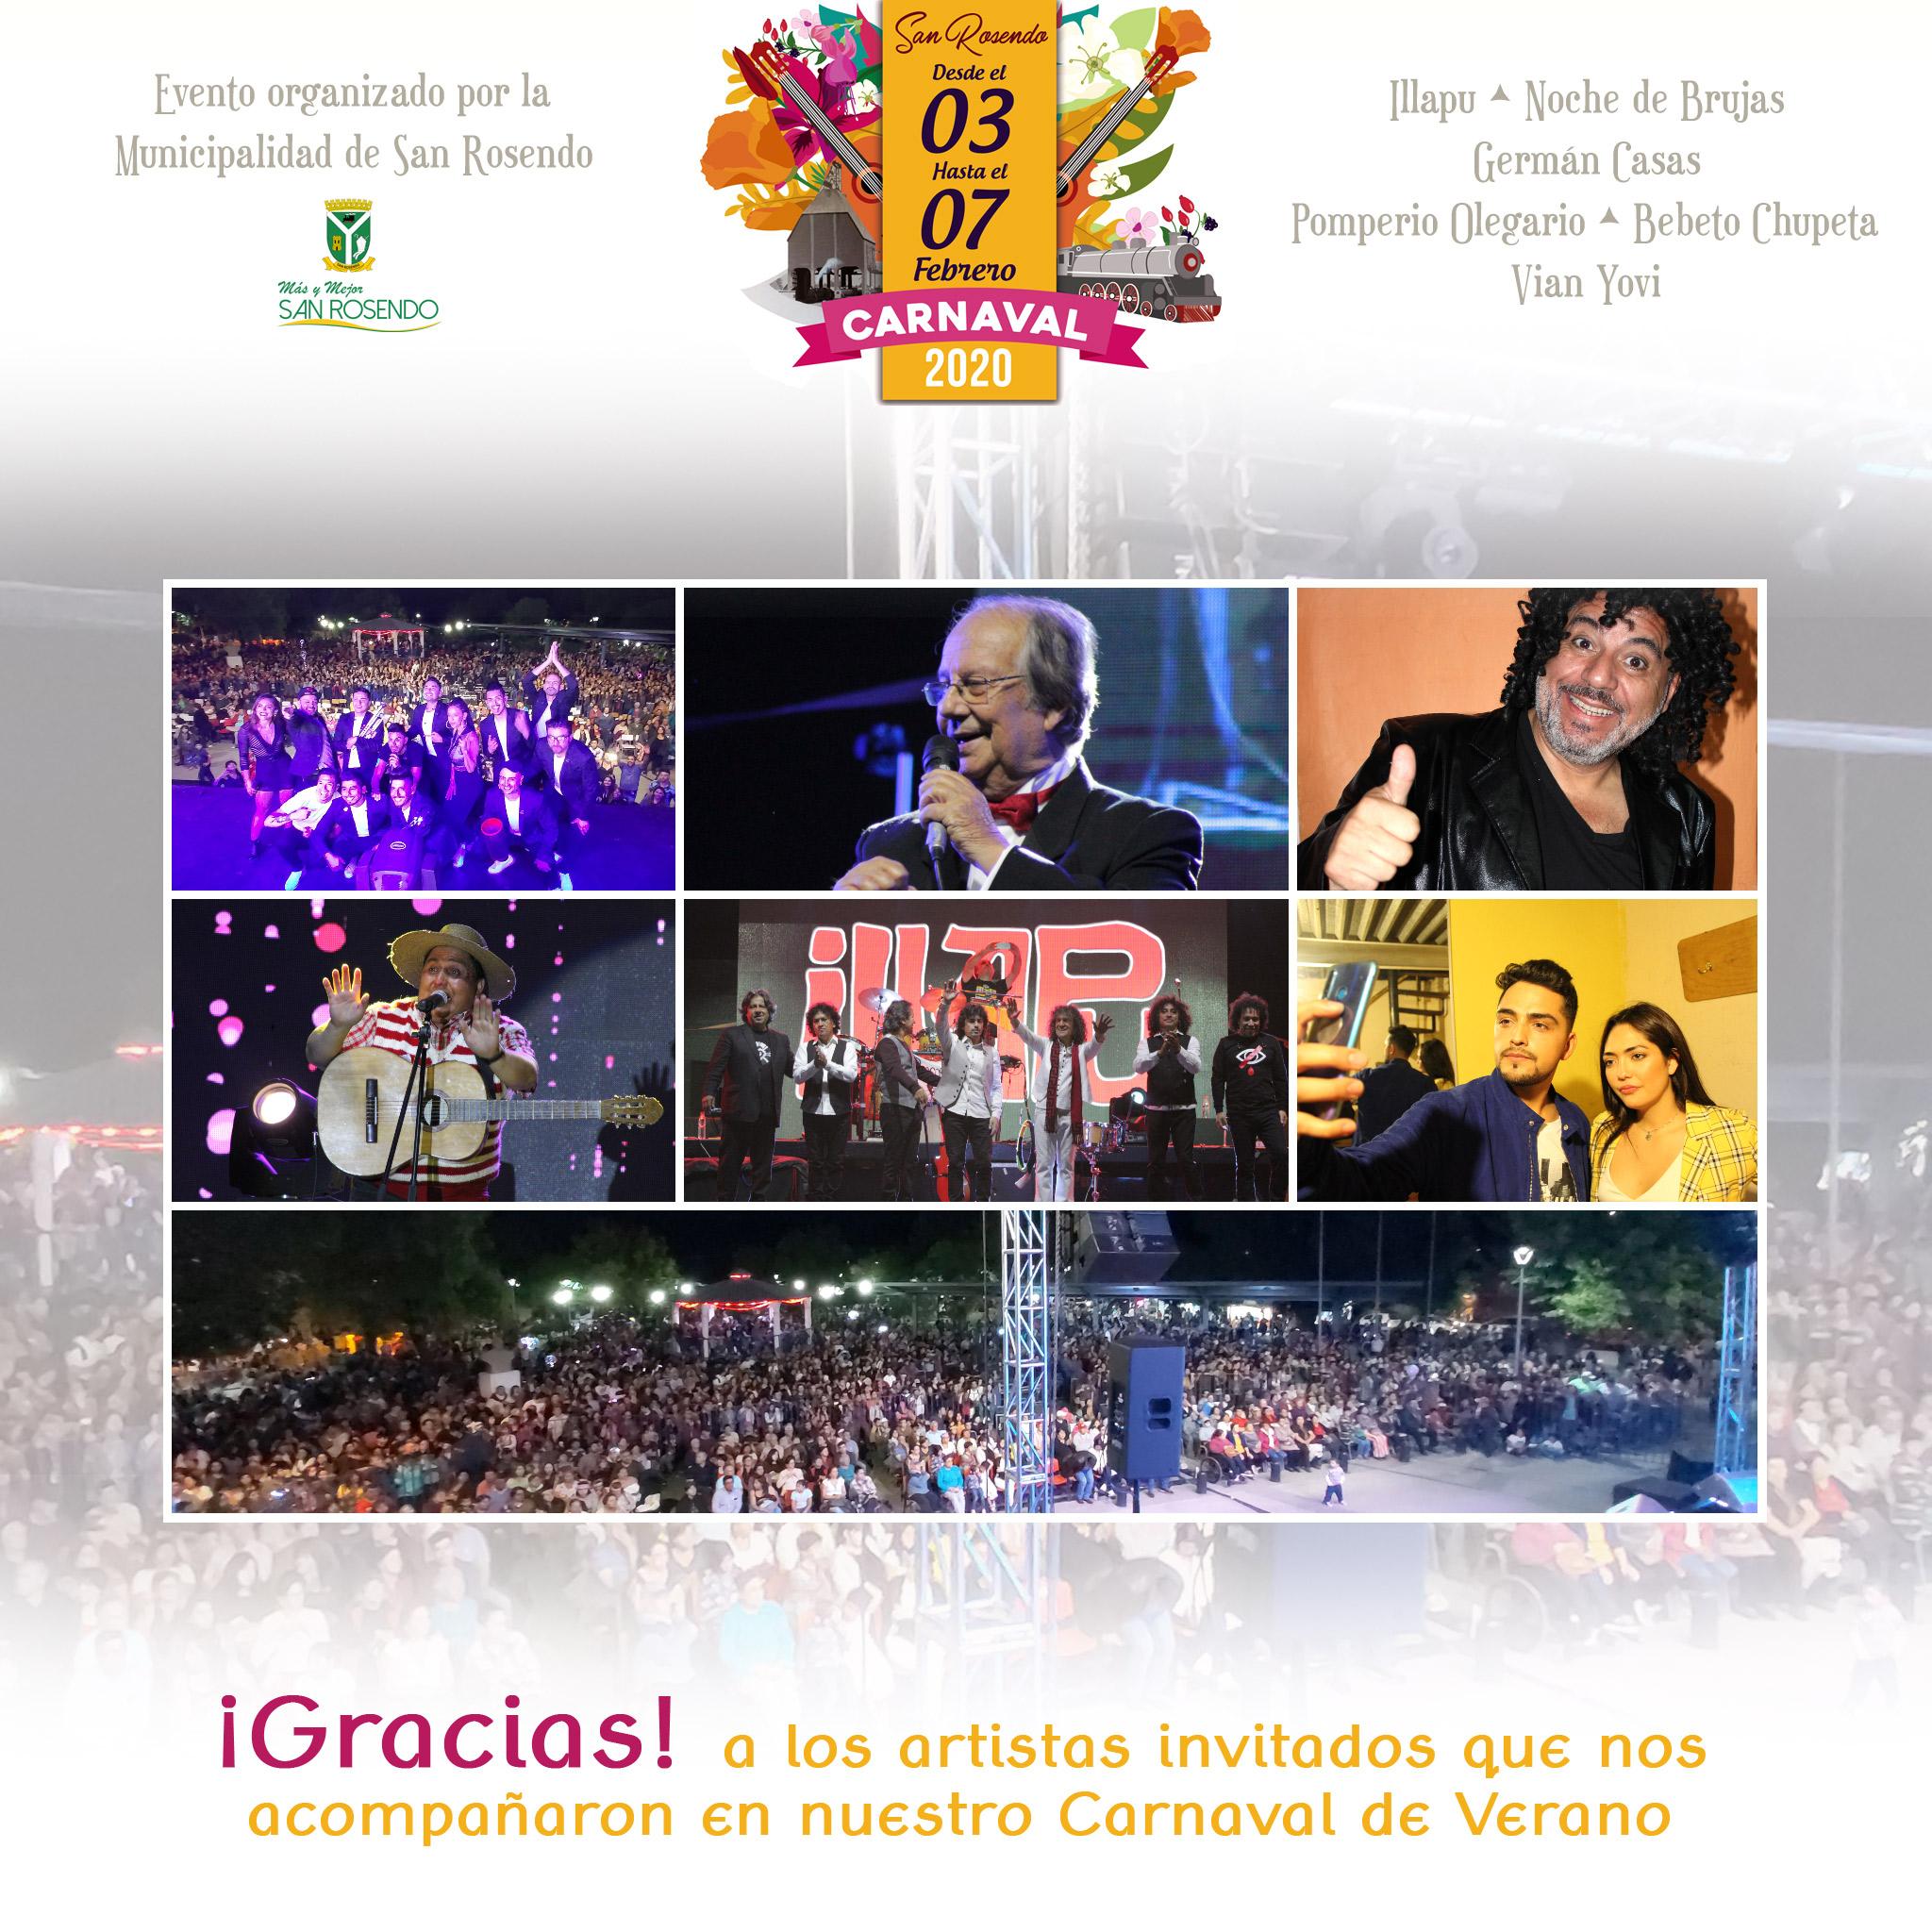 San Rosendo • Carnaval Verano San Rosendo 2020